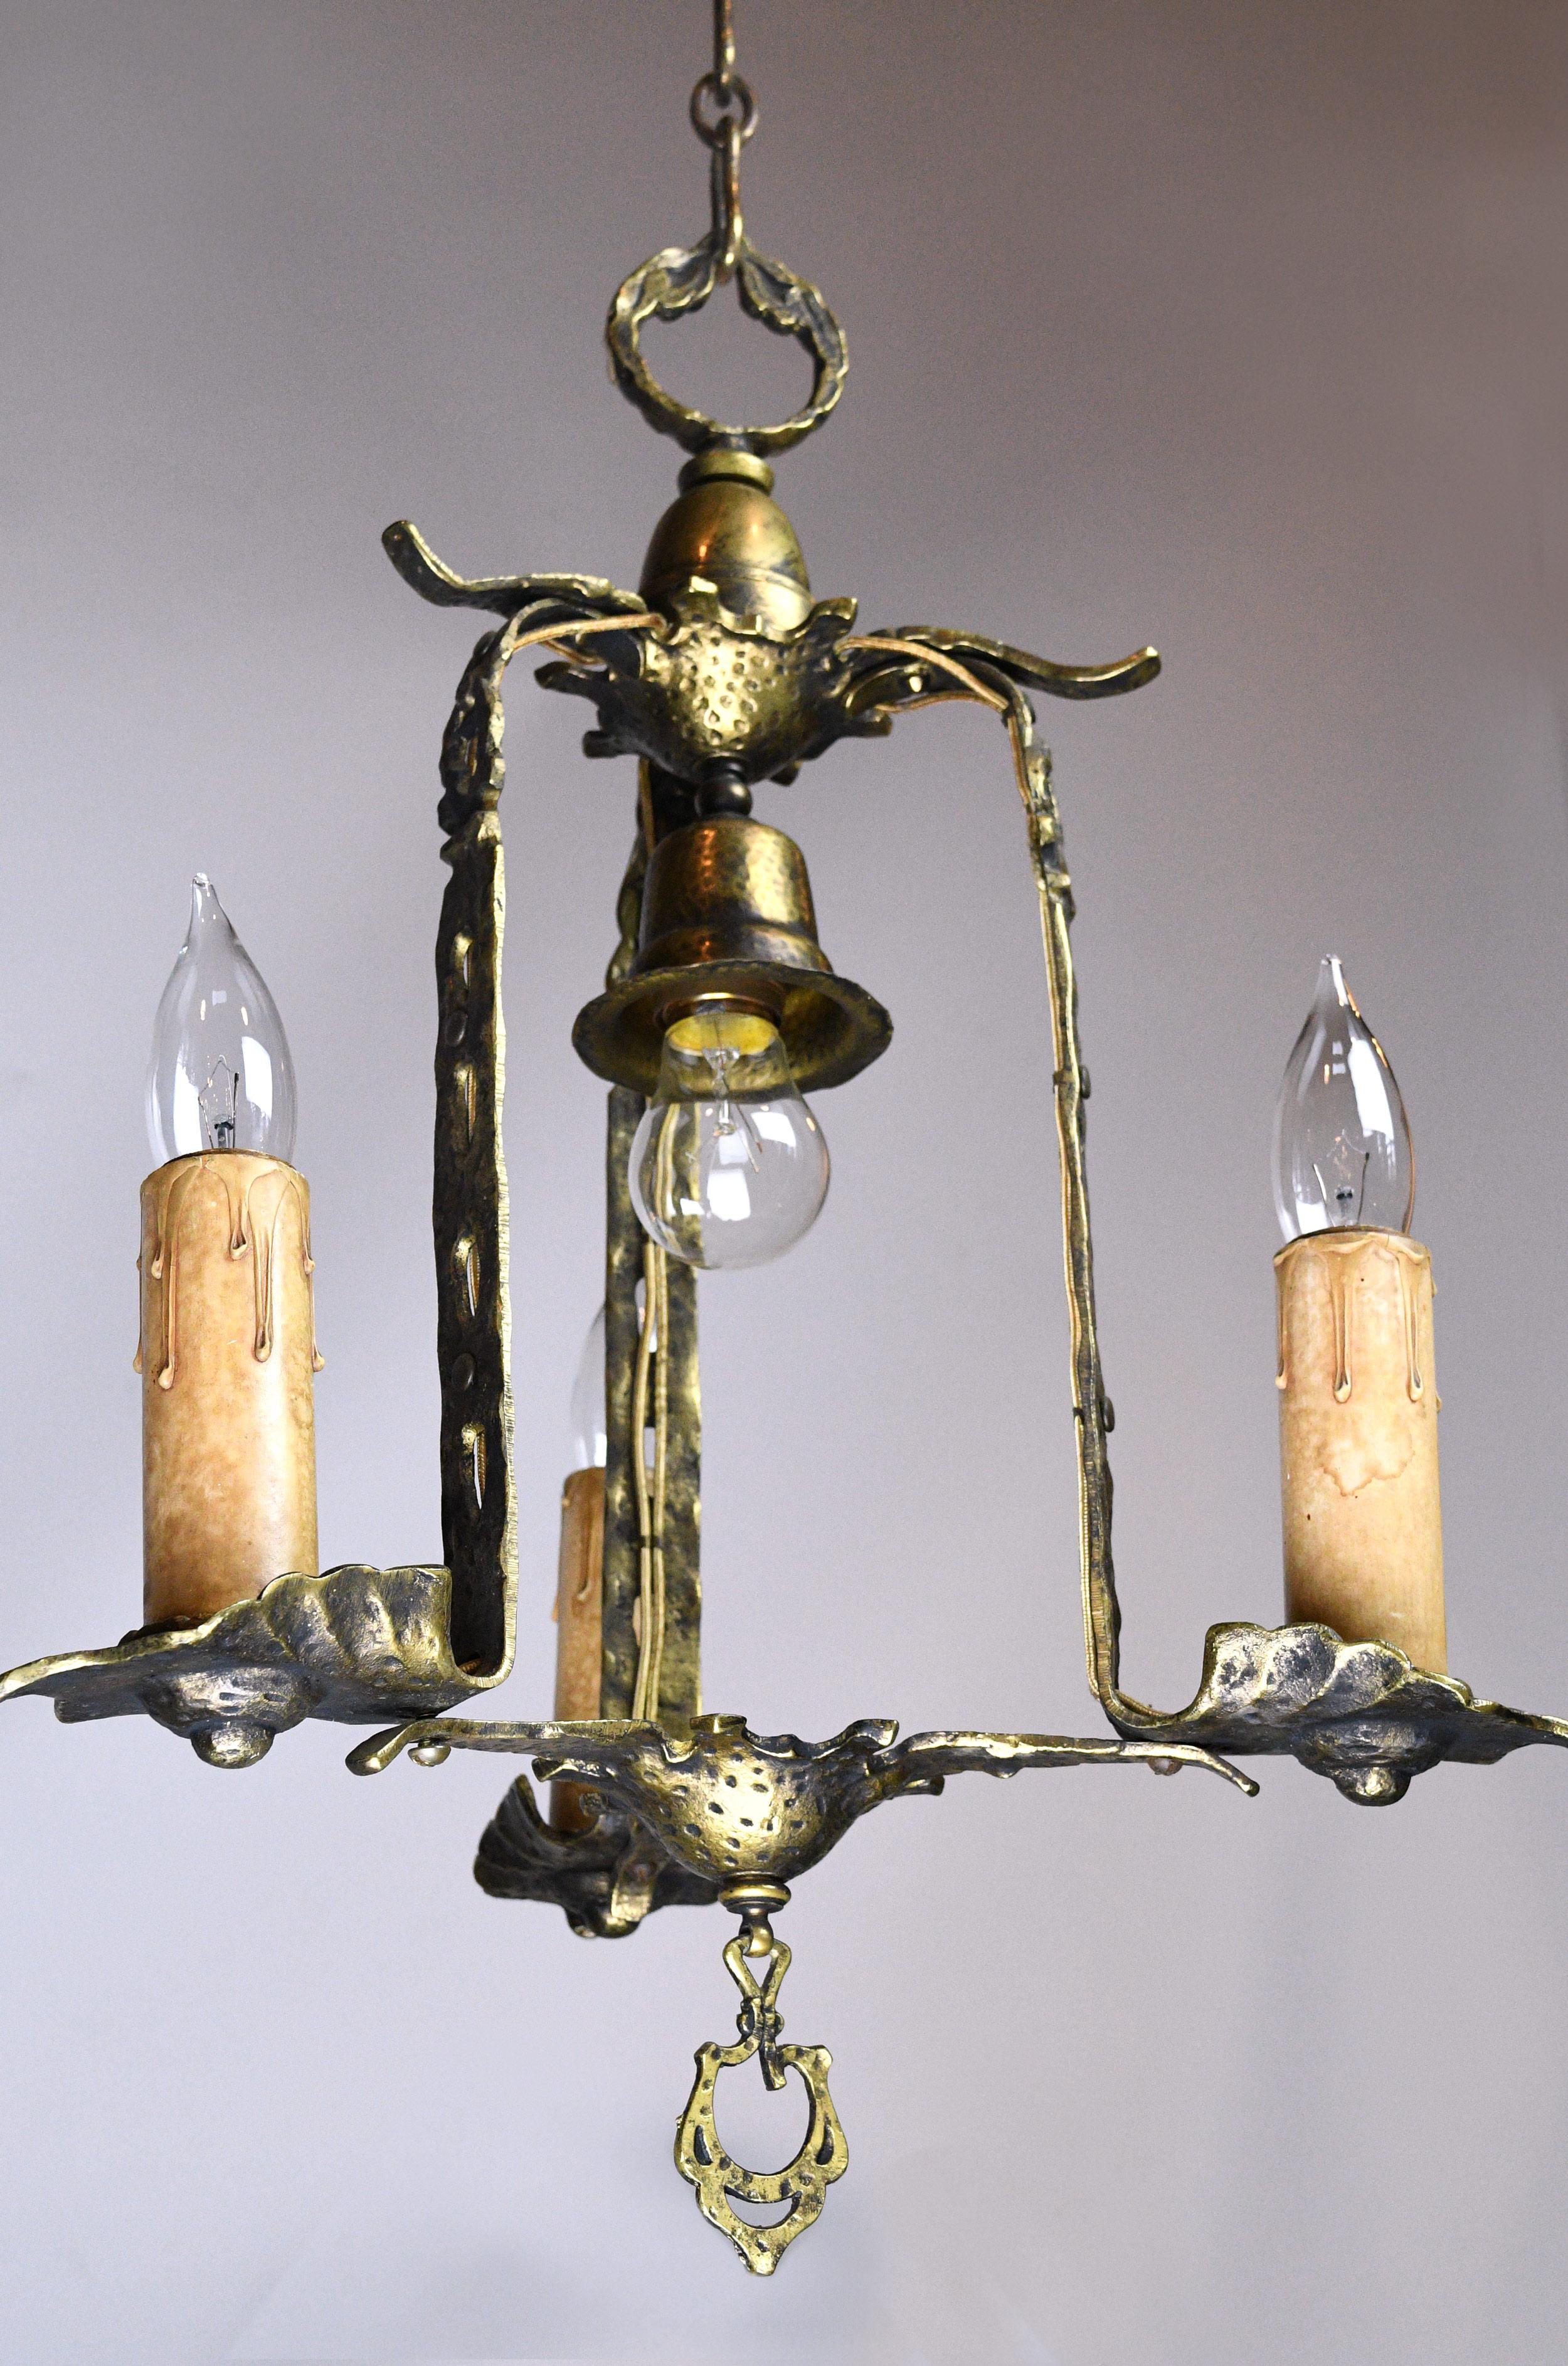 47443-tudor-three-candle-pendant-base-detail.jpg